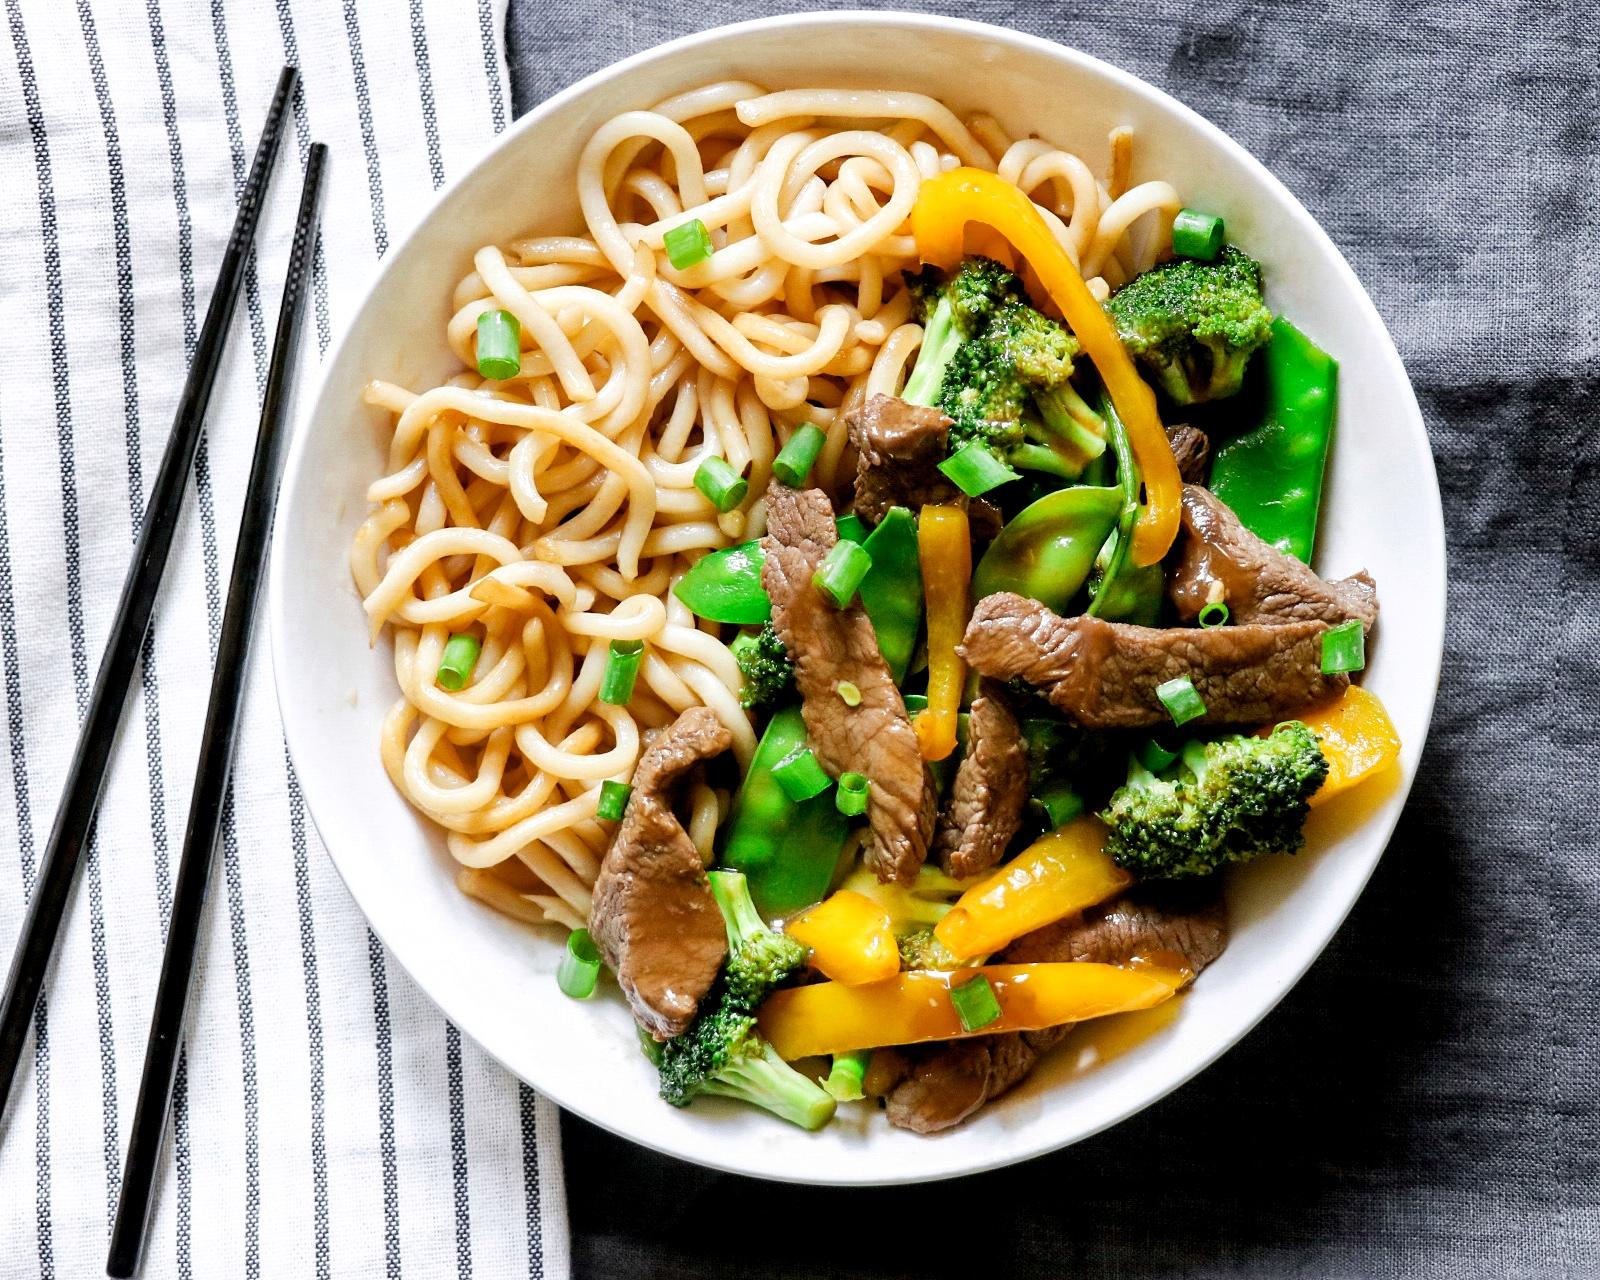 Quick and Easy Teriyaki Beef Stir-Fry